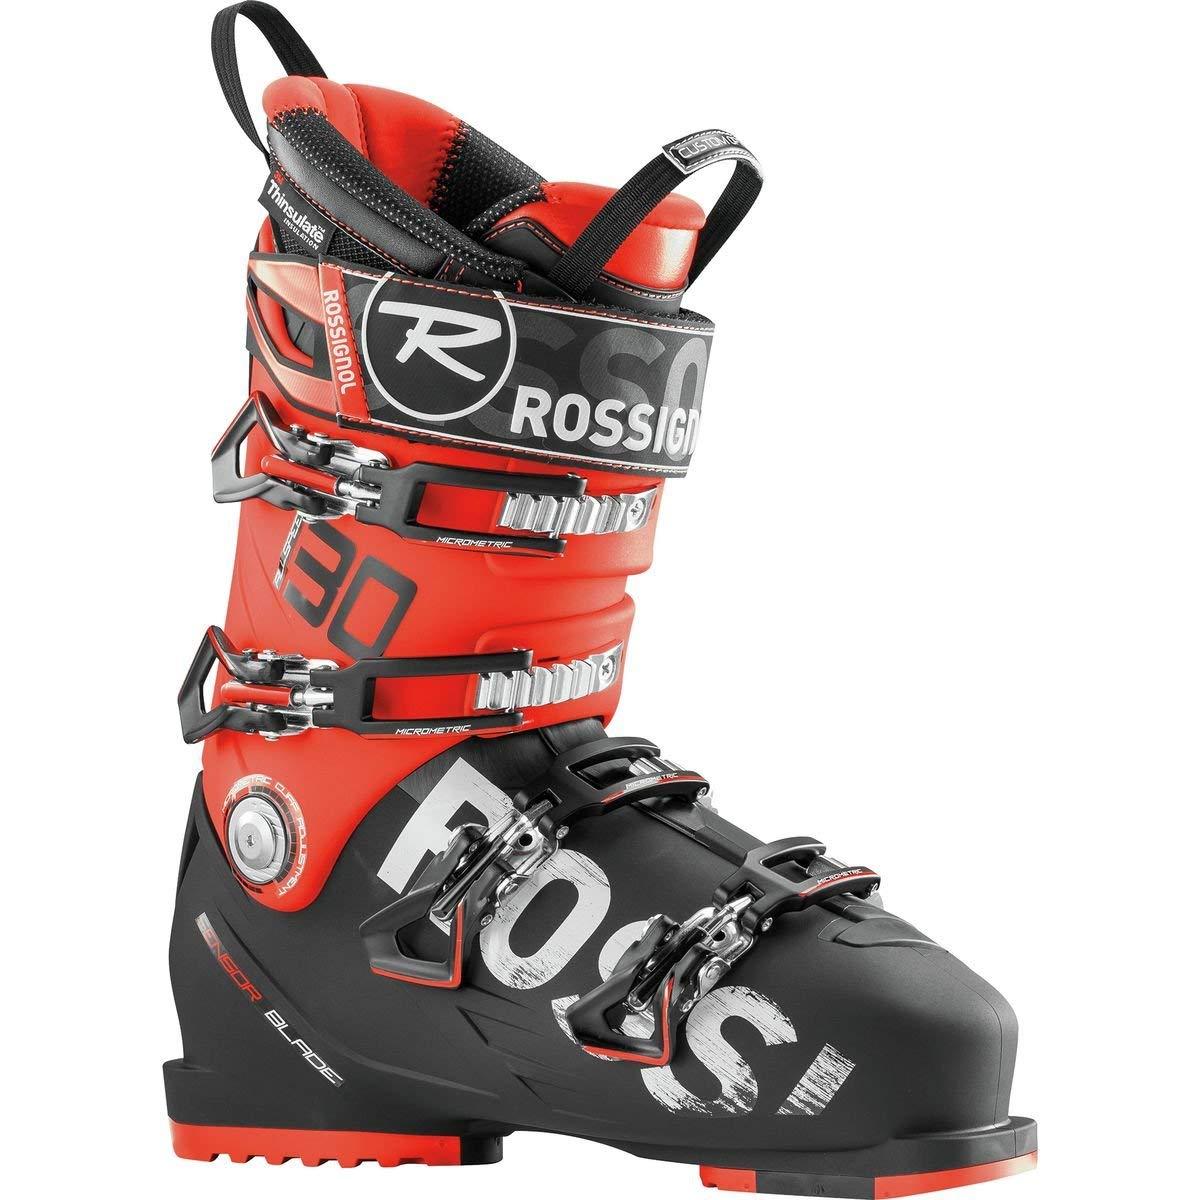 61d9812632 Get Quotations · Rossignol Allspeed 130 Ski Boots Black Red 25.5